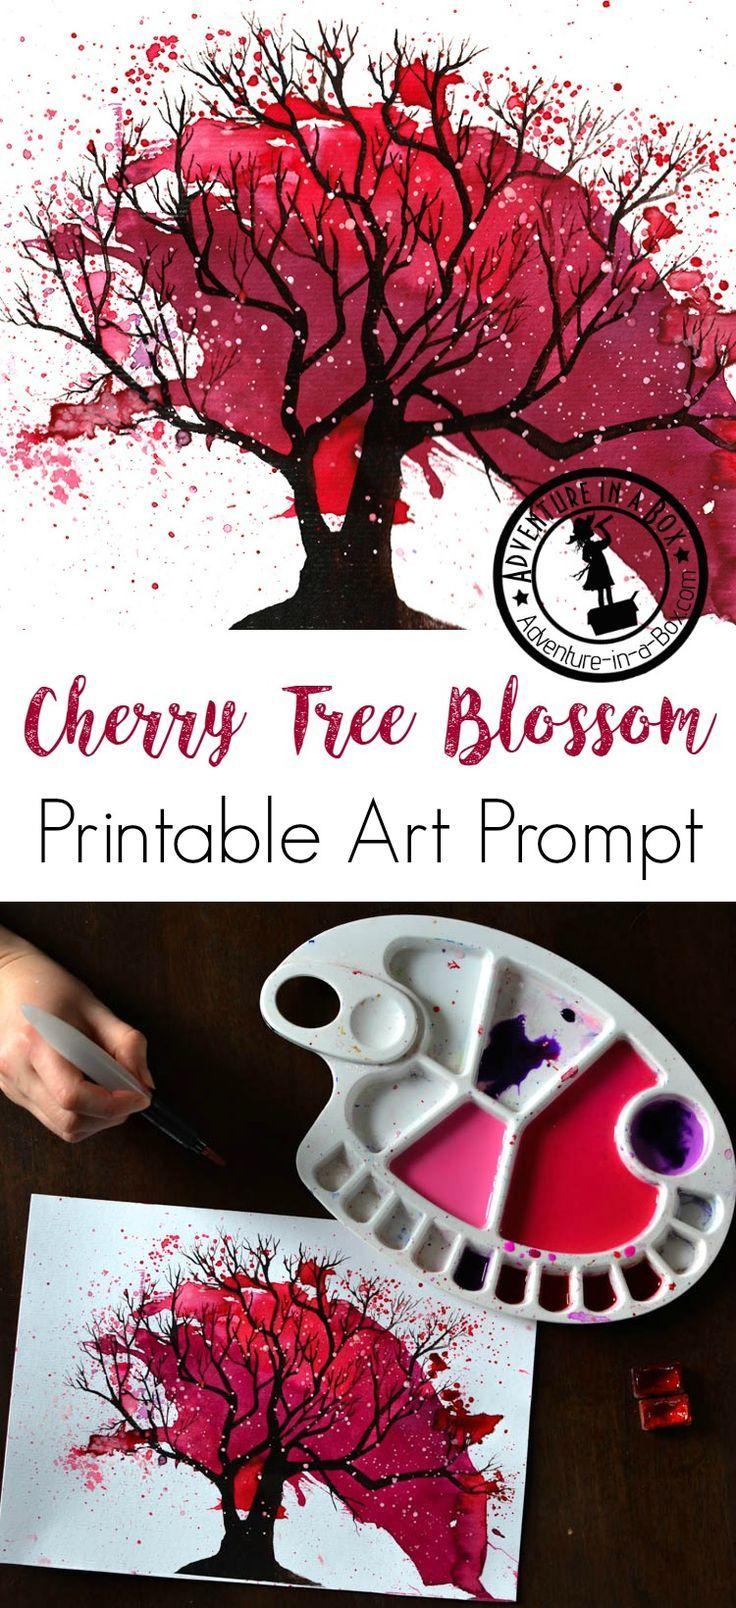 cherry tree blossom splatter art with printable prompt - Printable Art For Kids